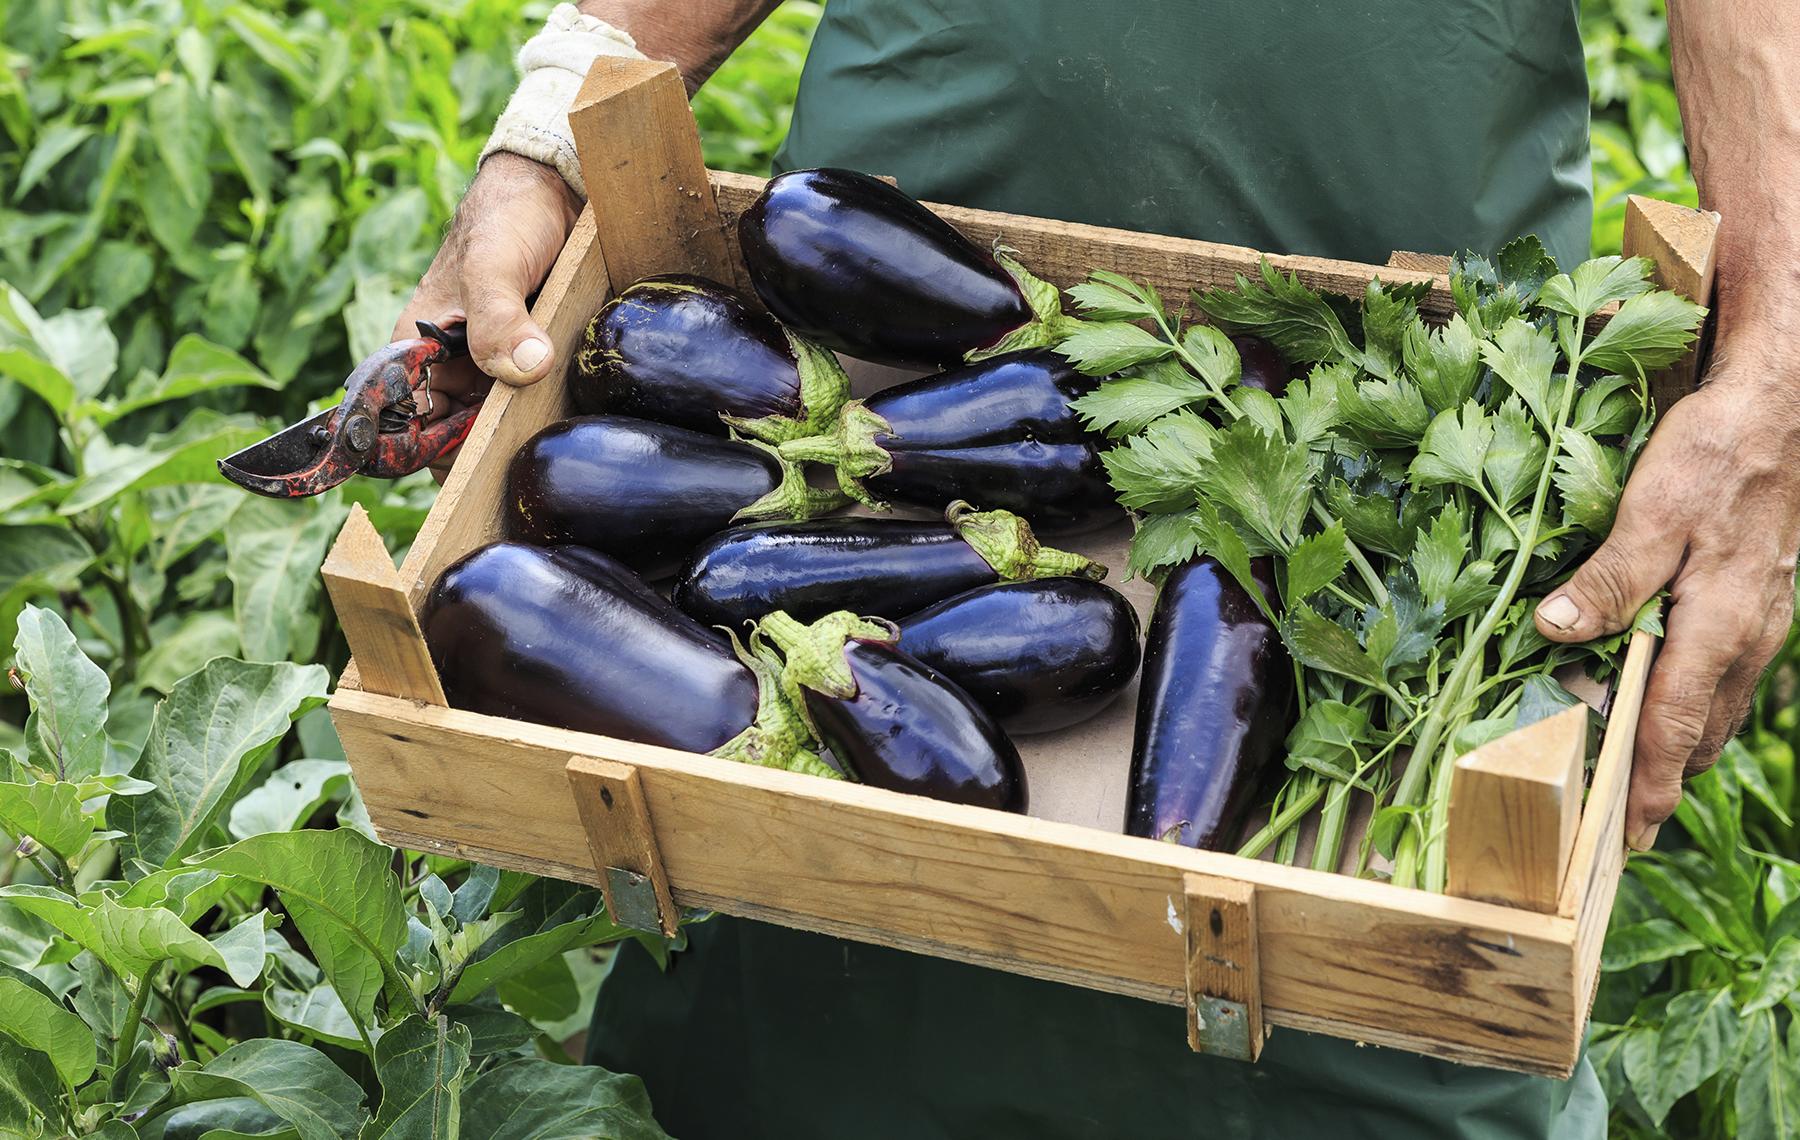 Farmer holding a wood box full with eggplants